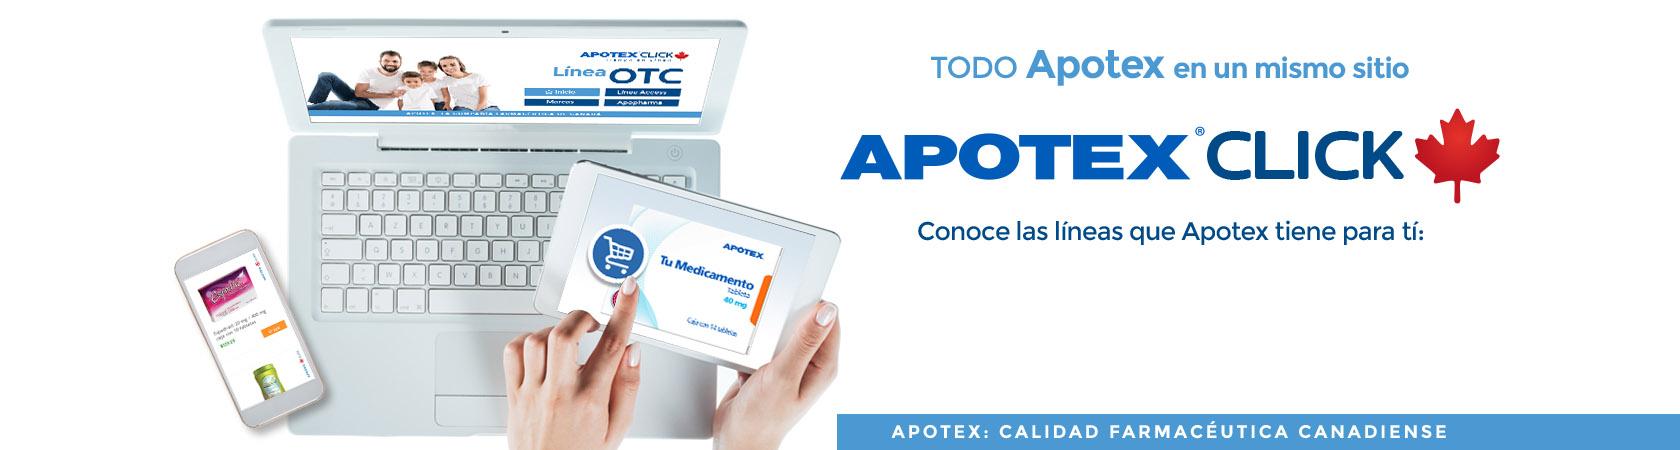 Homepage_Apotex_1680x400-1-